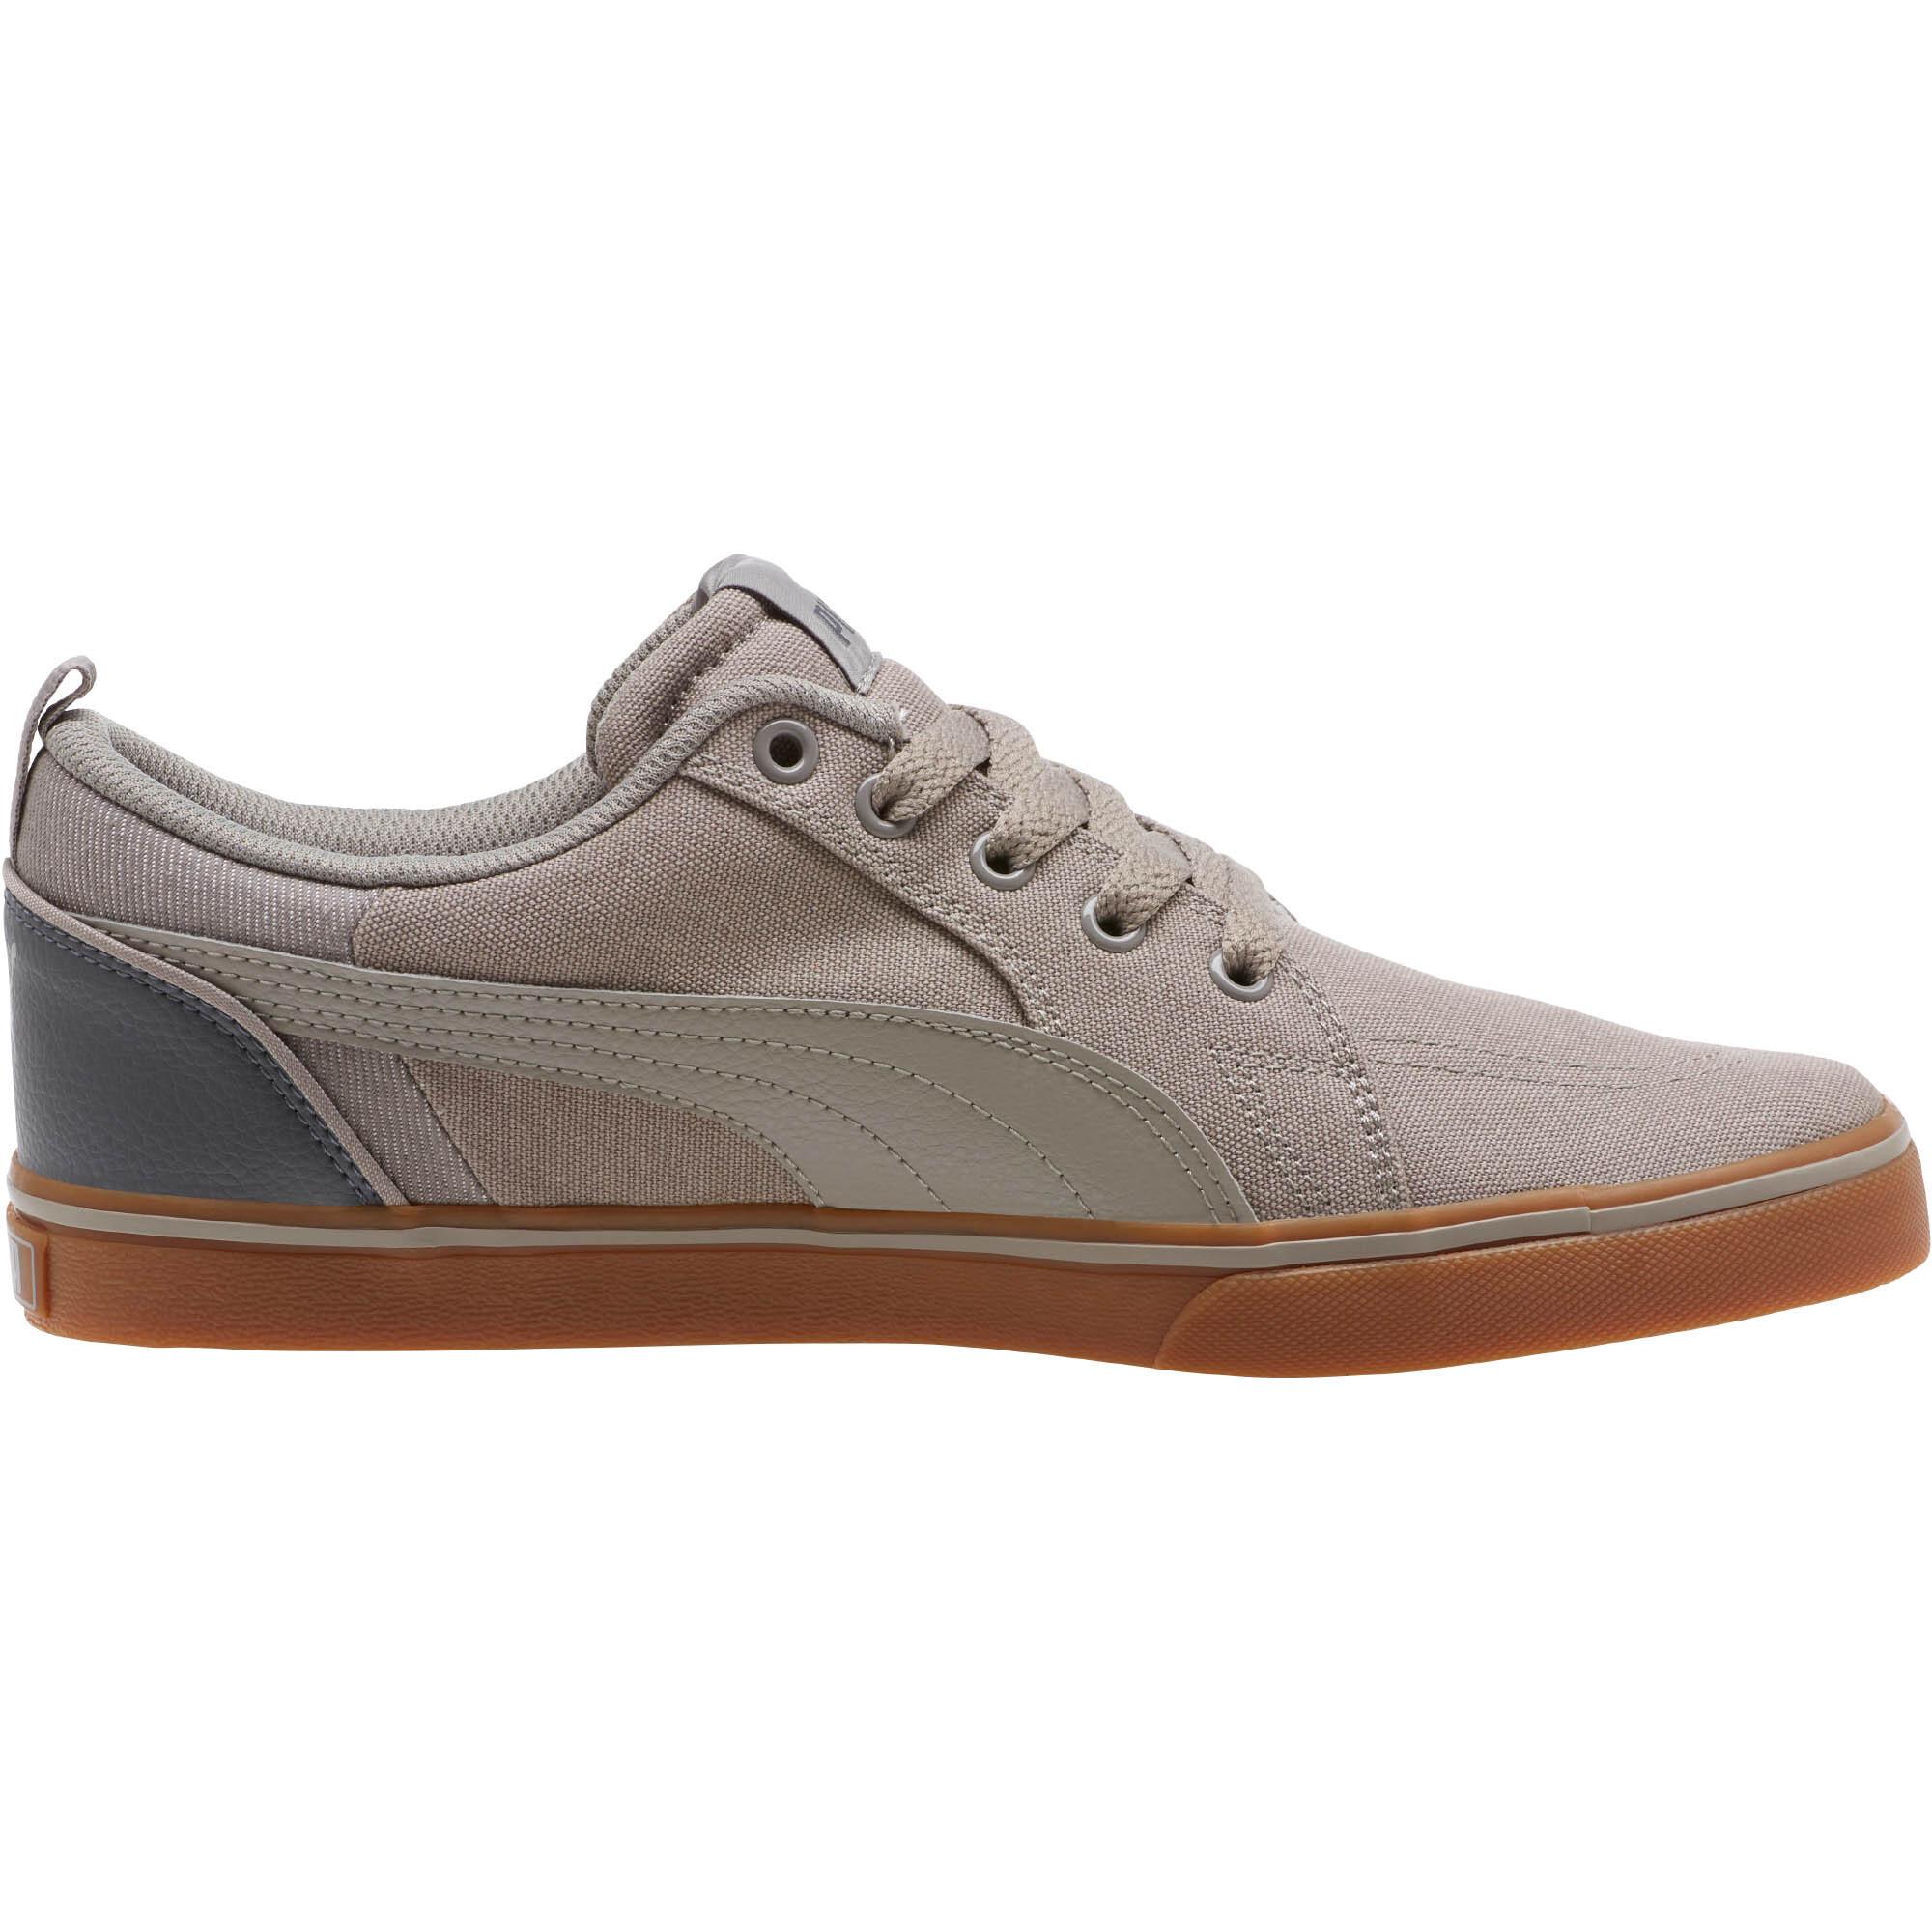 PUMA-PUMA-Bridger-Men-039-s-Sneakers-Men-Shoe-Basics thumbnail 11